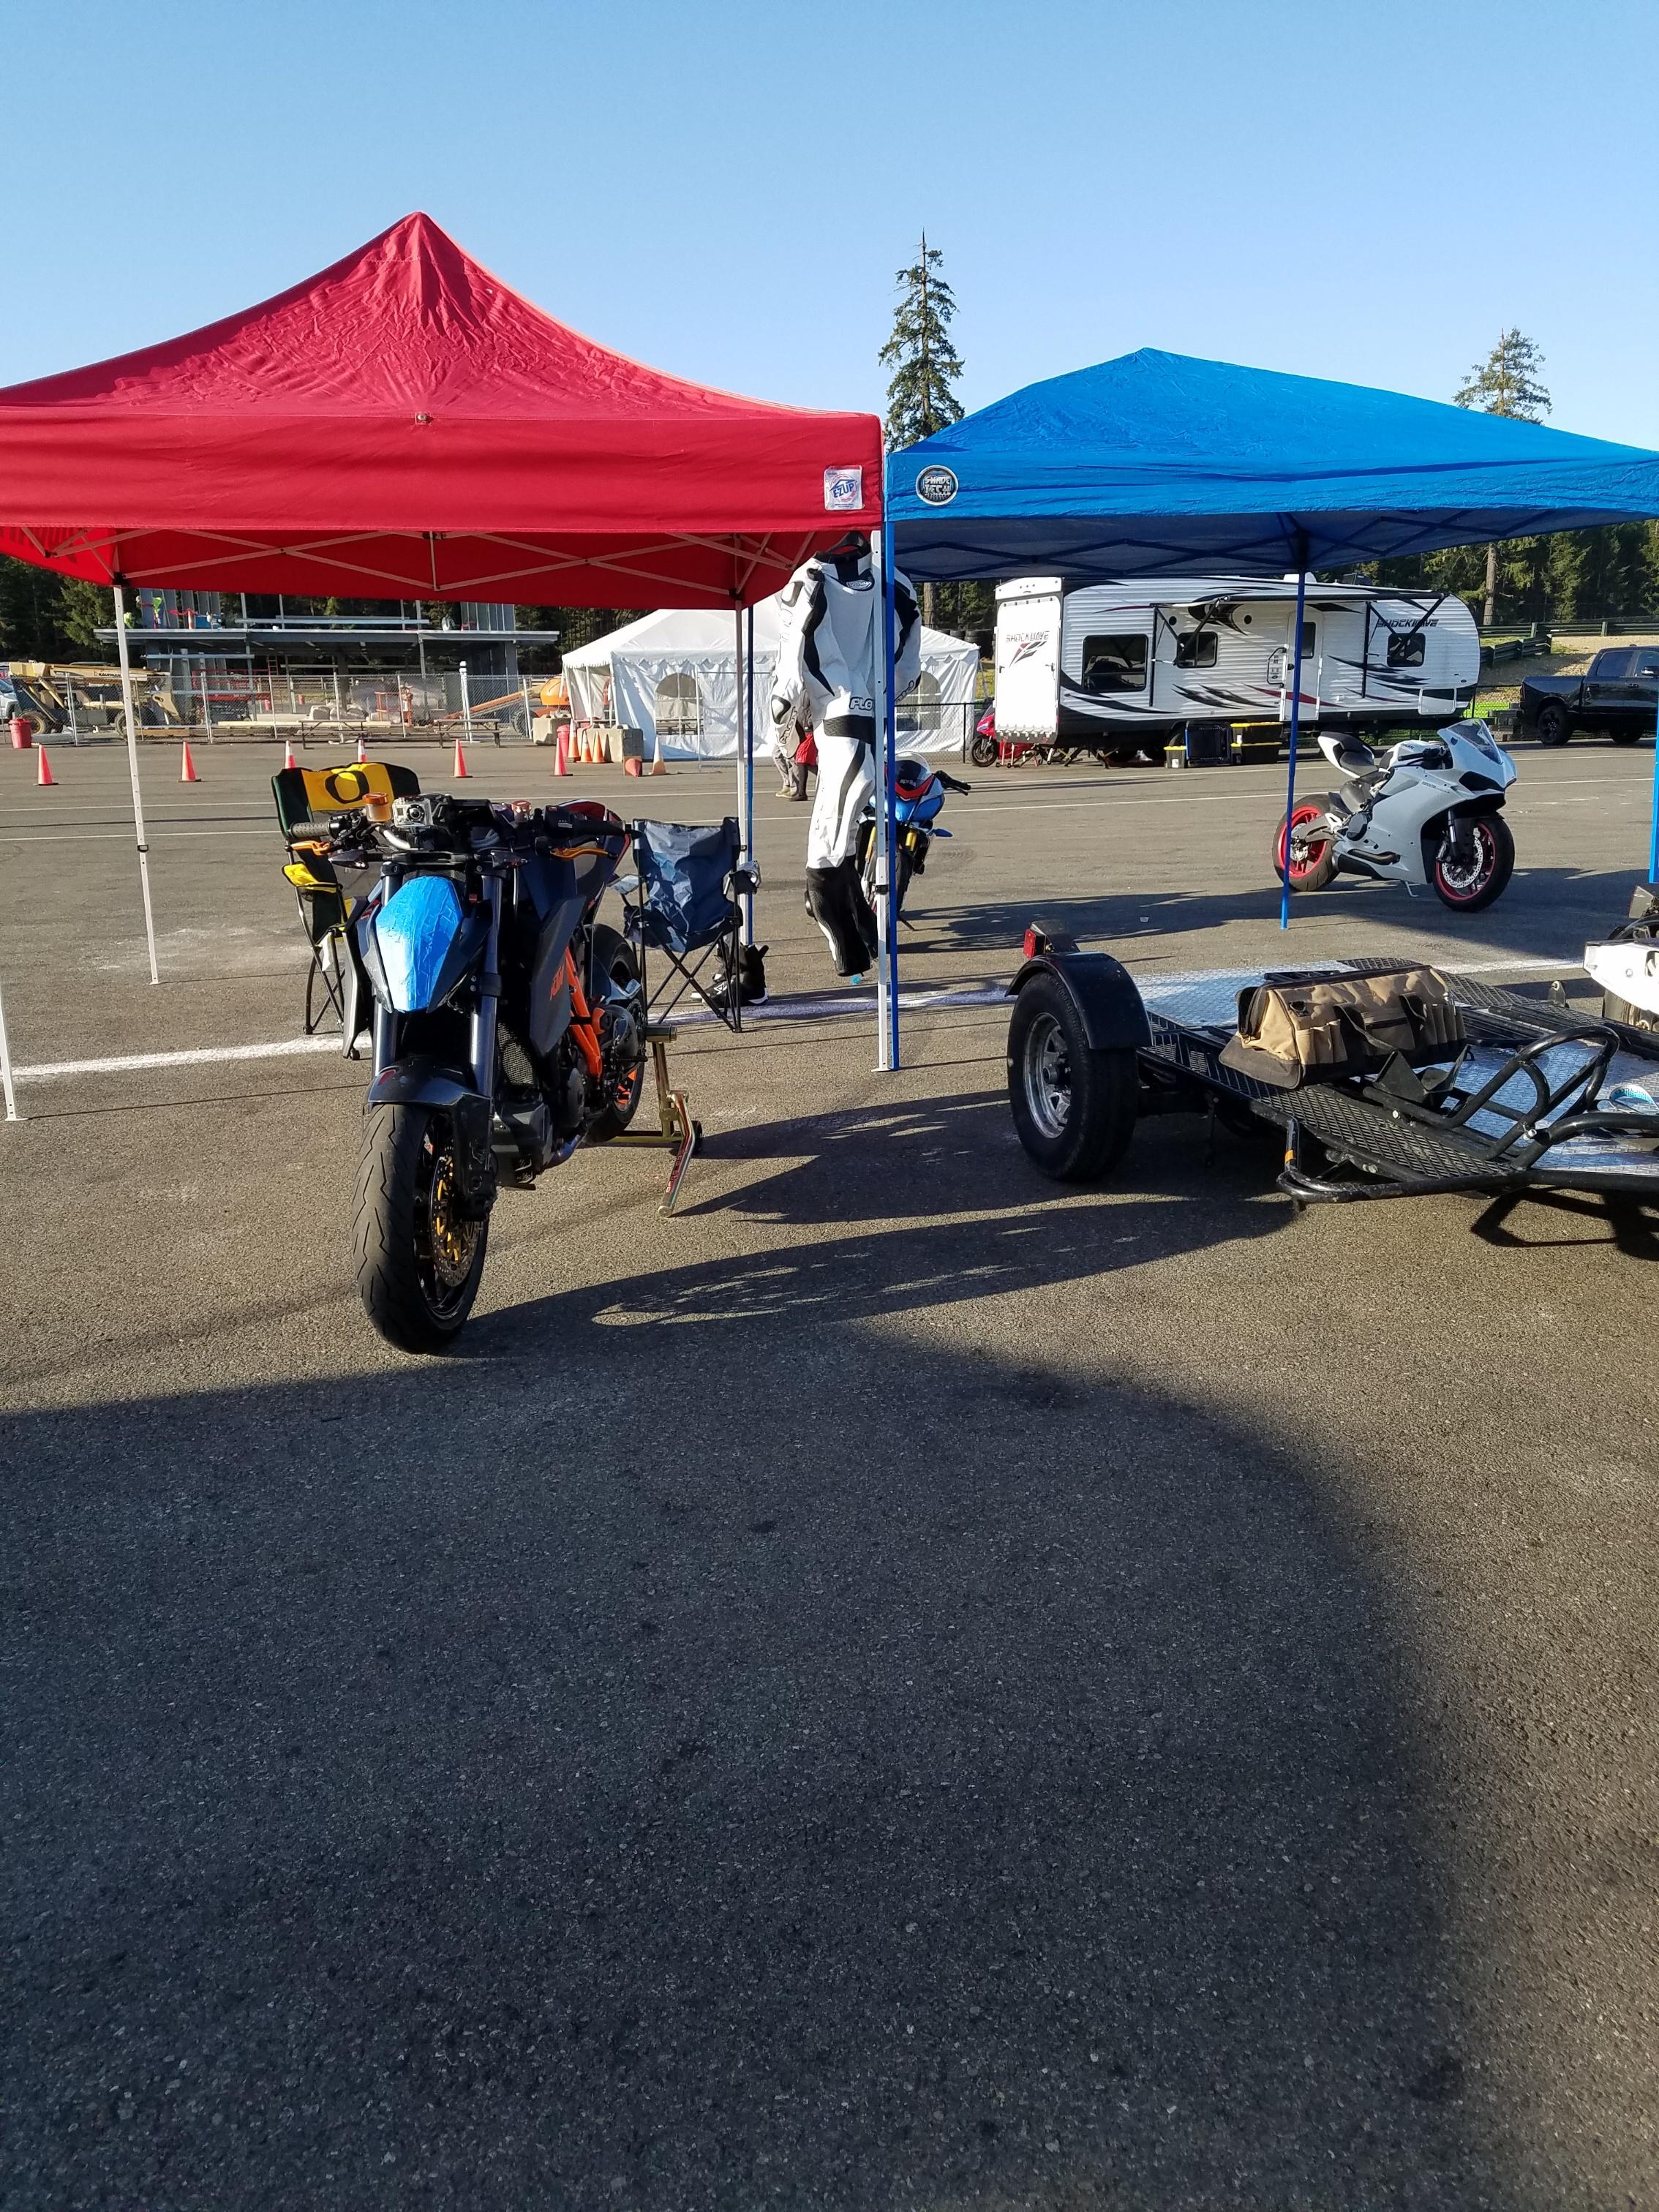 Aprilia Racers day-20190506_072805_resized.jpg